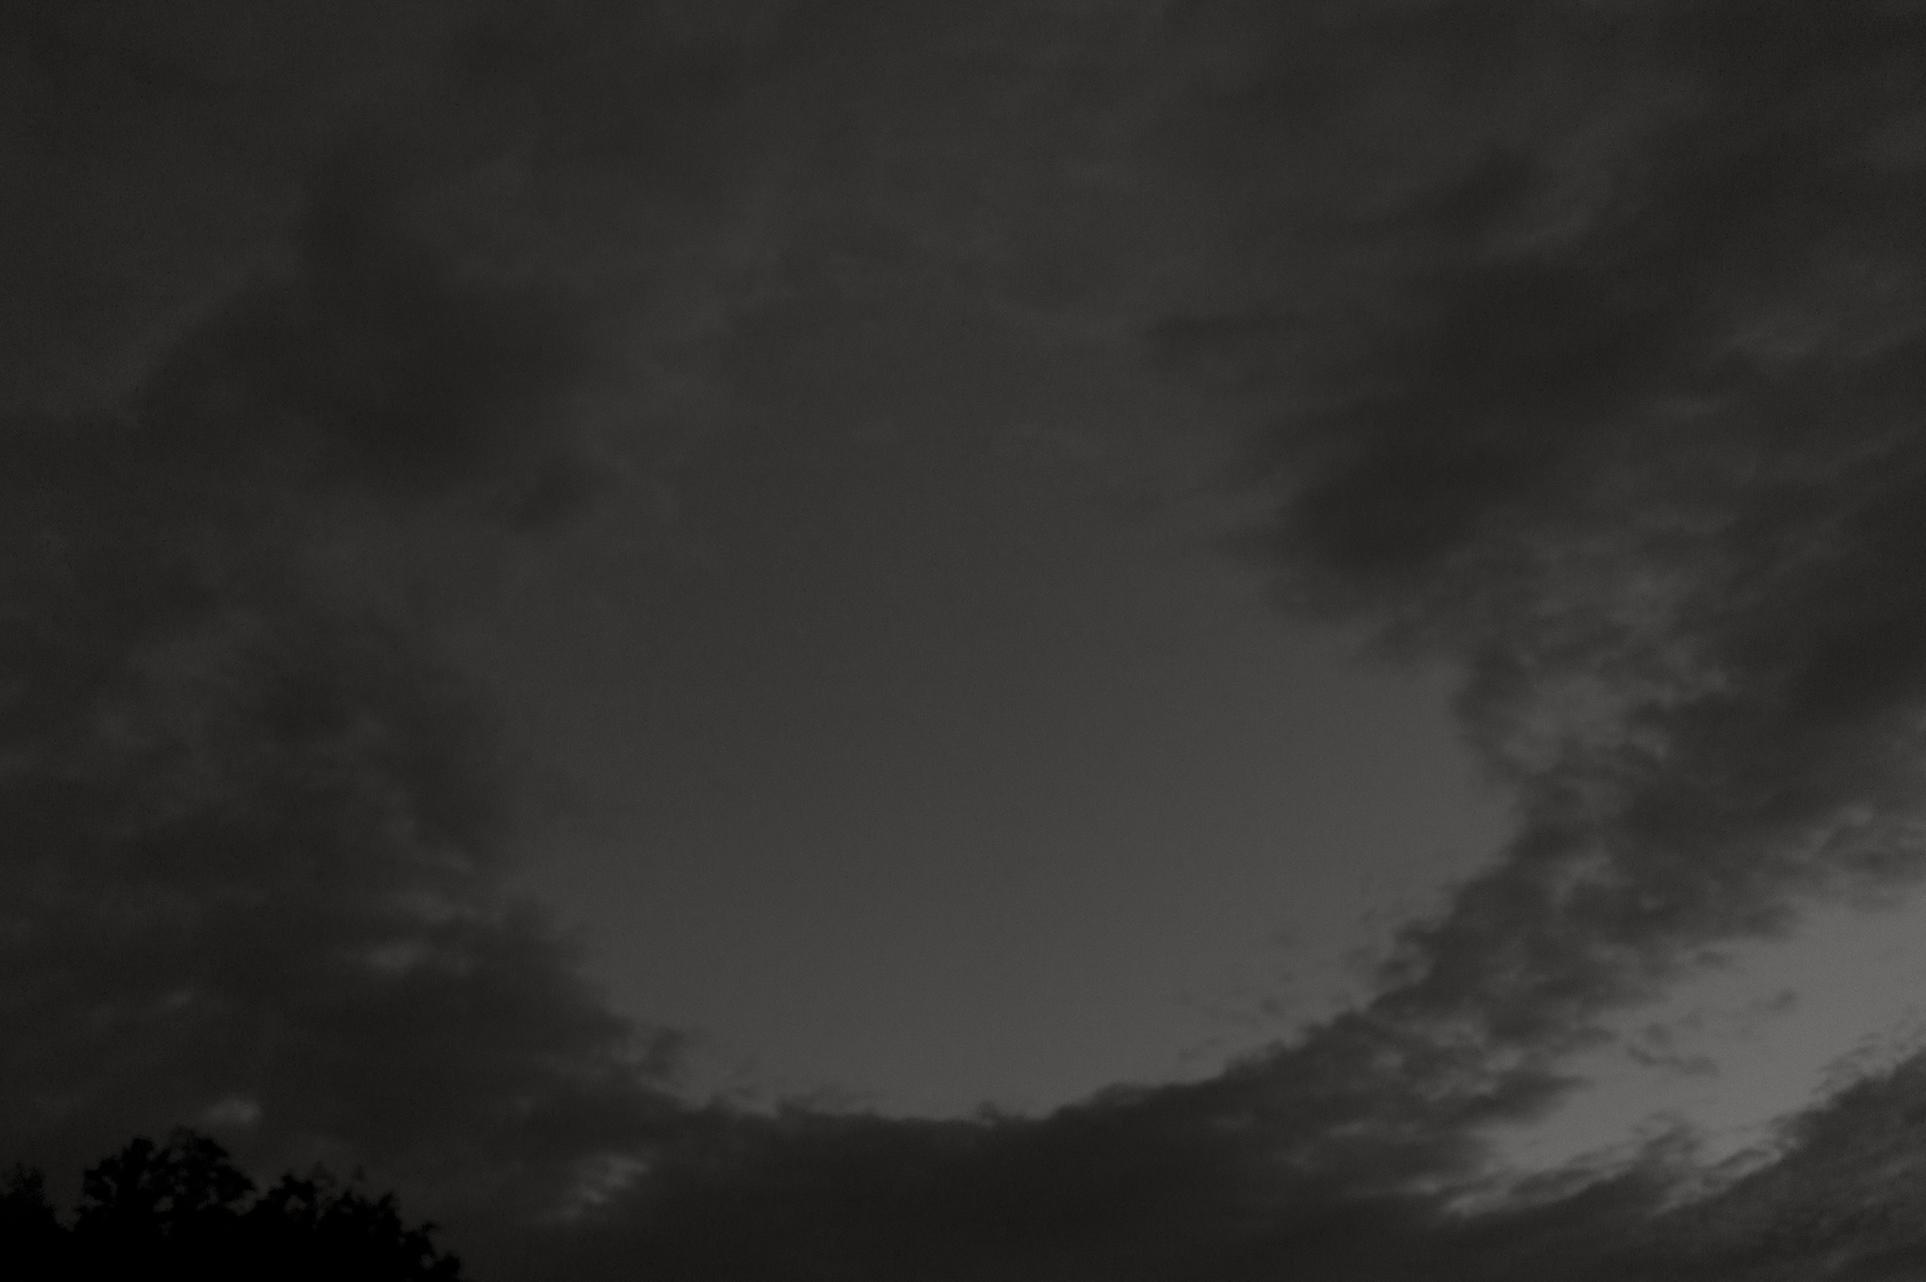 _Abstract image presse 11 © olivier degen